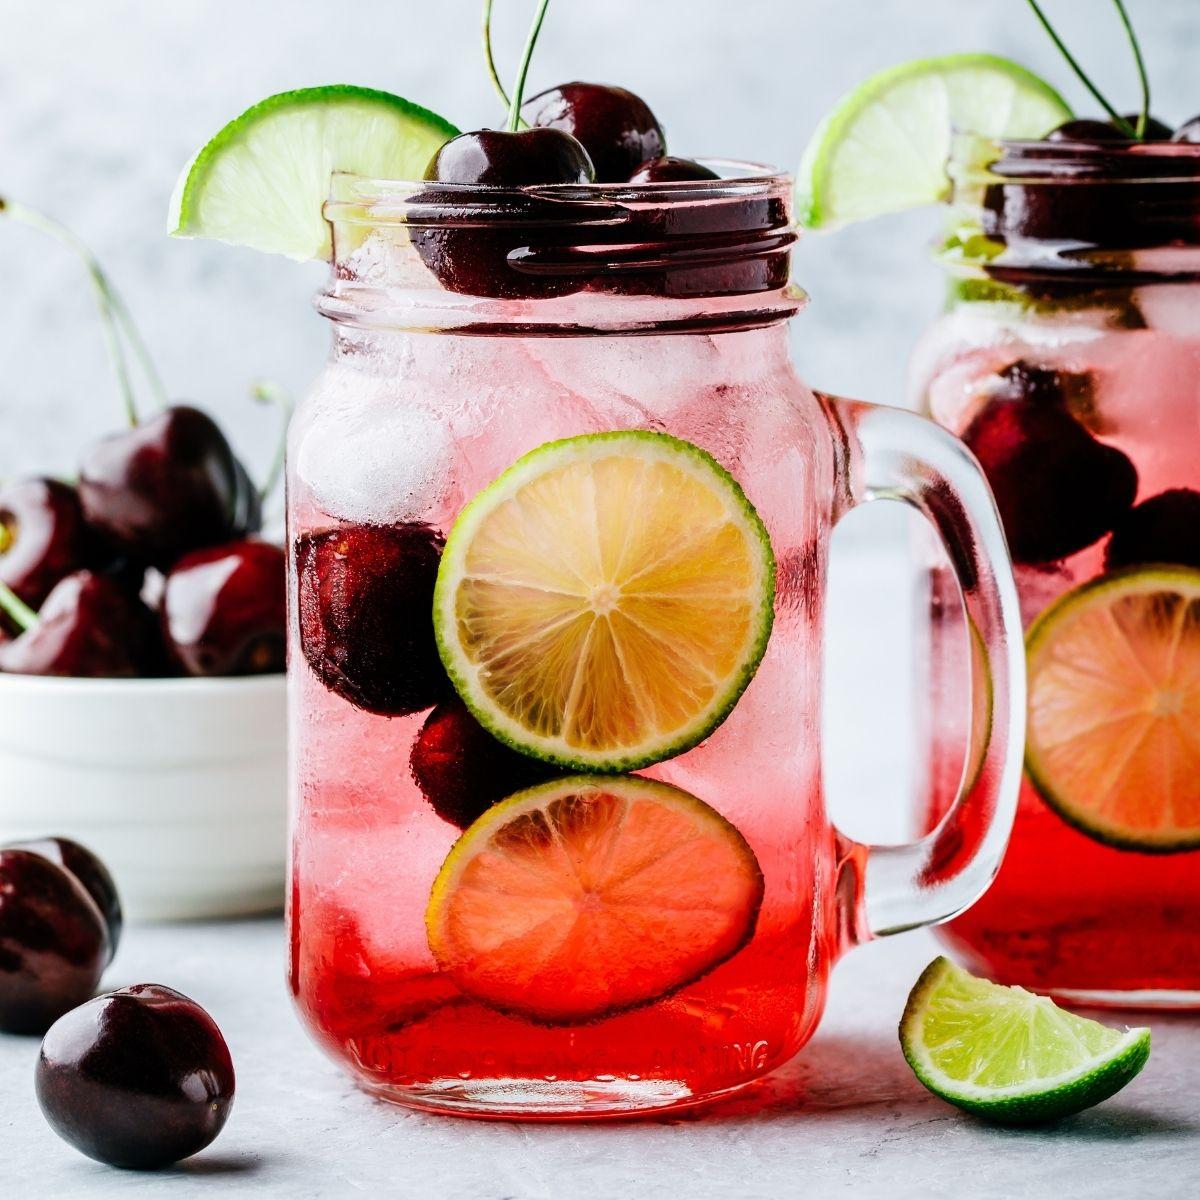 Cherry limeade in a mason jar mug.